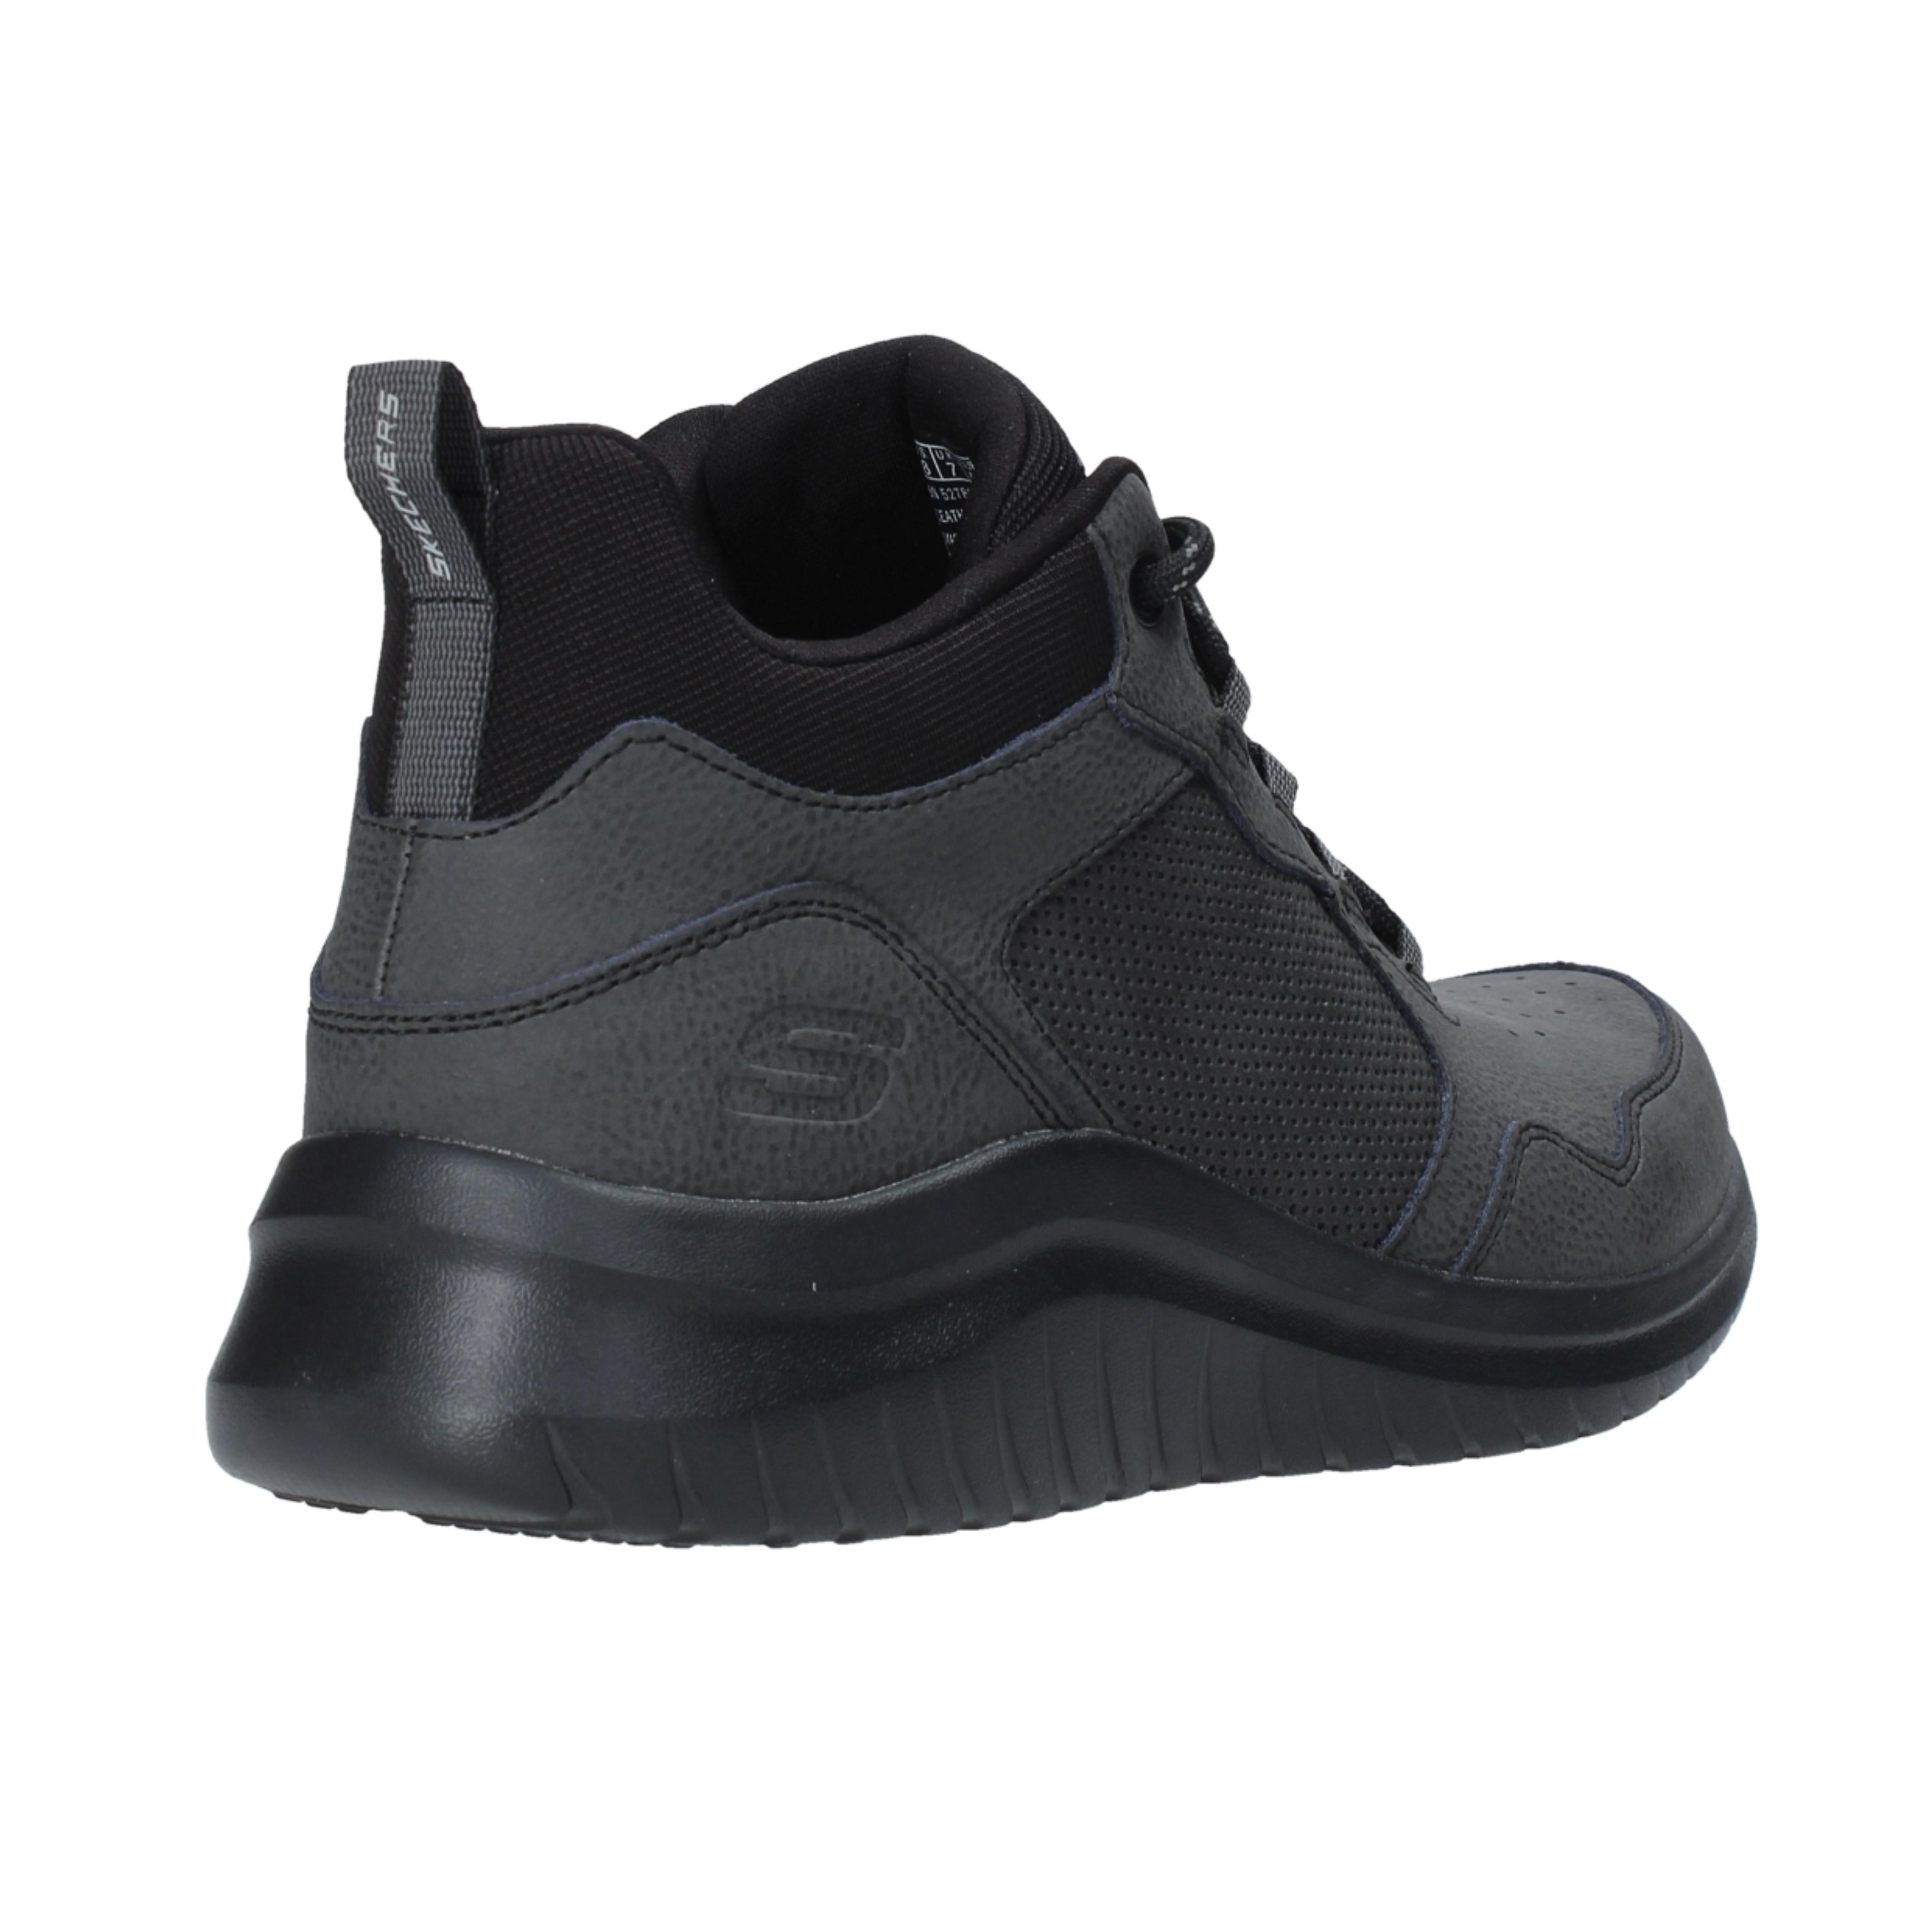 Sneakers Uomo Ultra Flex 2.0 Skechers 52780 BBK  -9